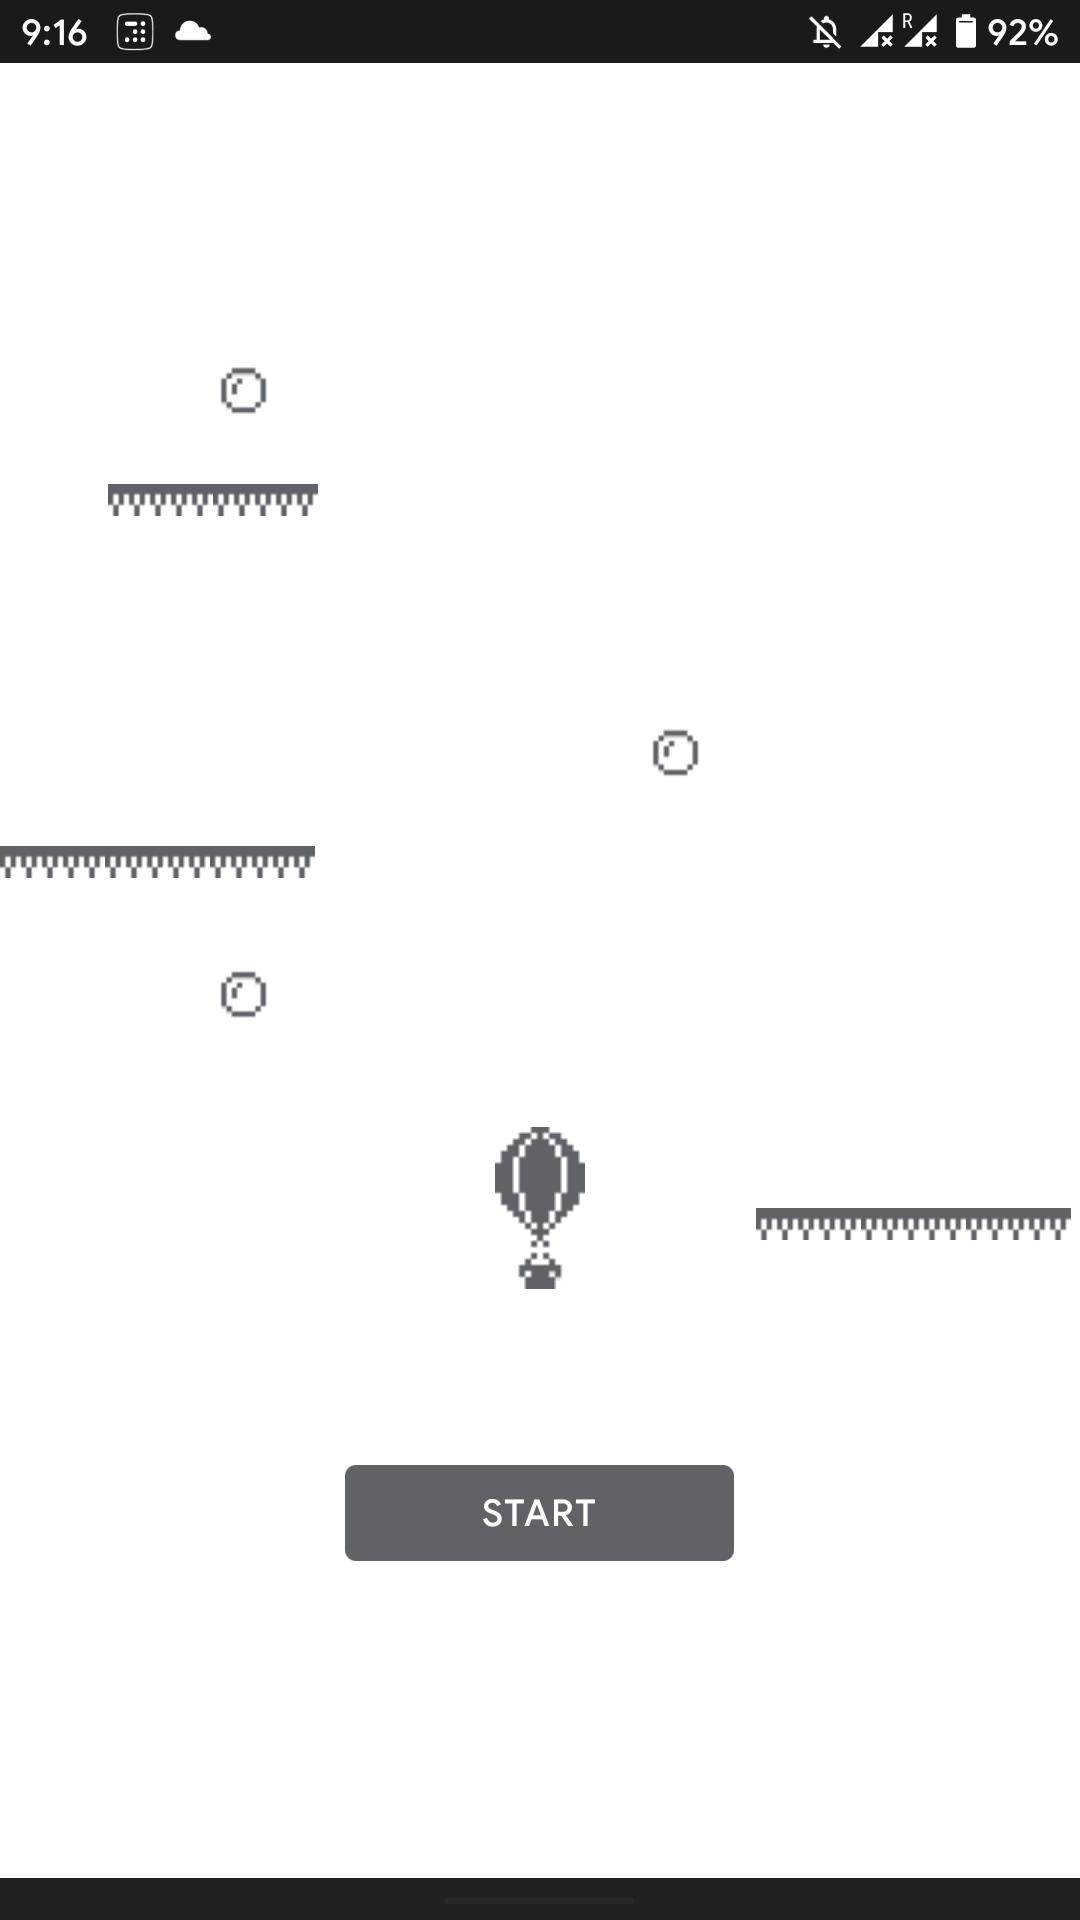 Hot Air Baloon: El mini juego oculto en la Play Store